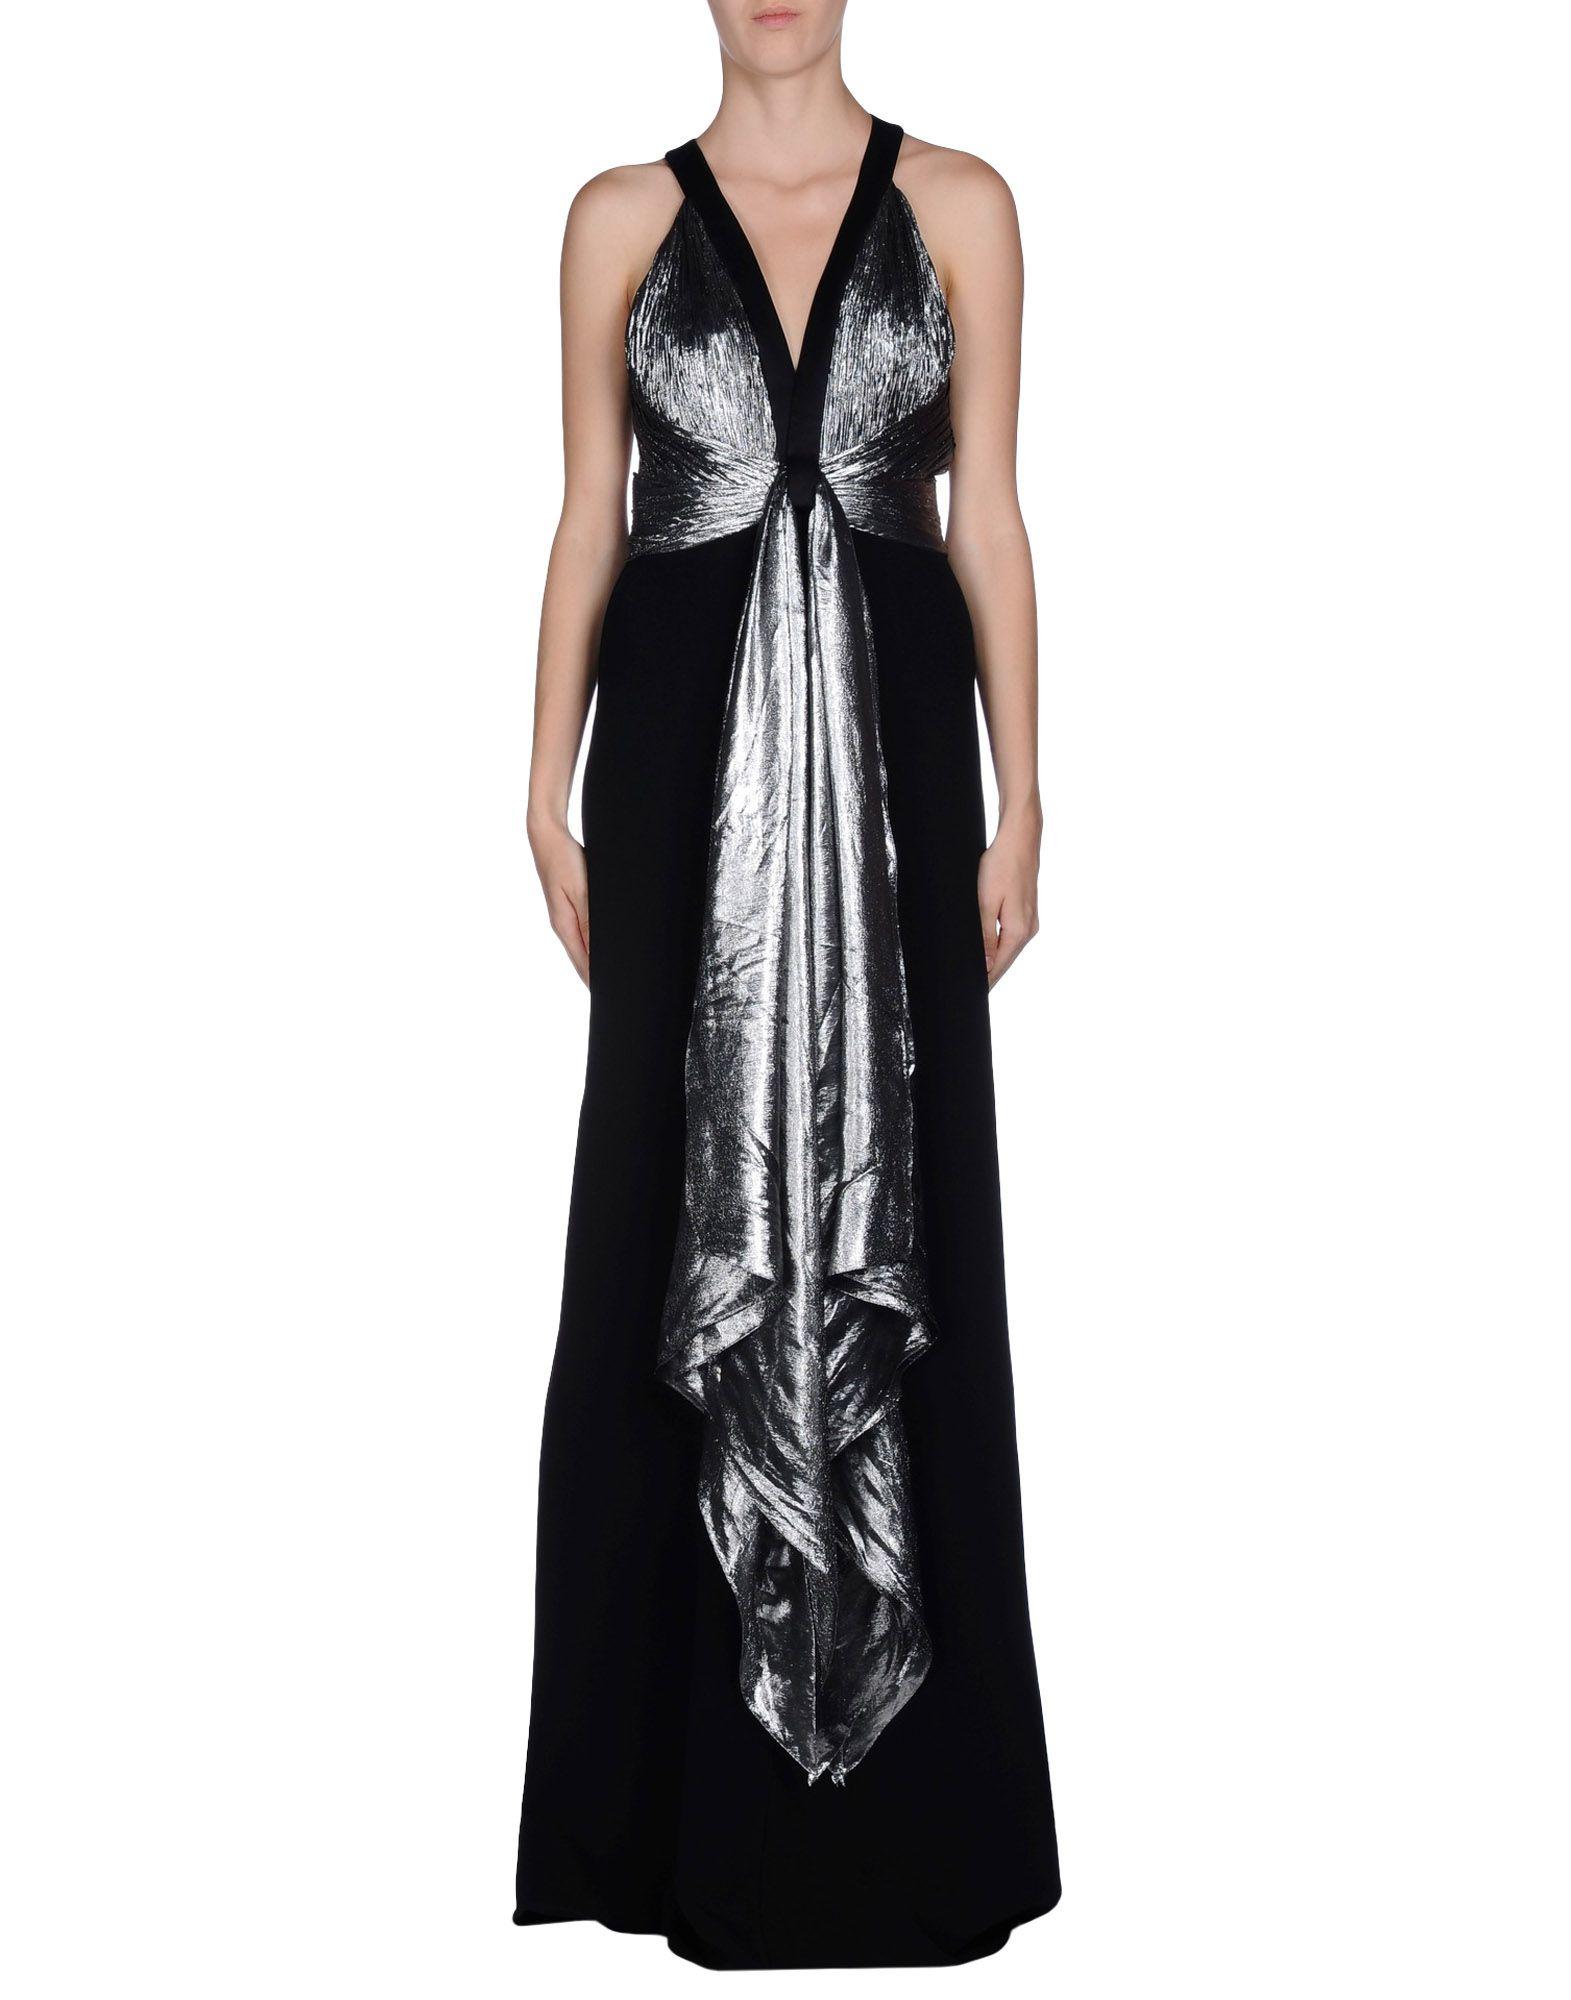 Model Michael Kors Logo Plate Trim Womenu0026#39;s Dress Black